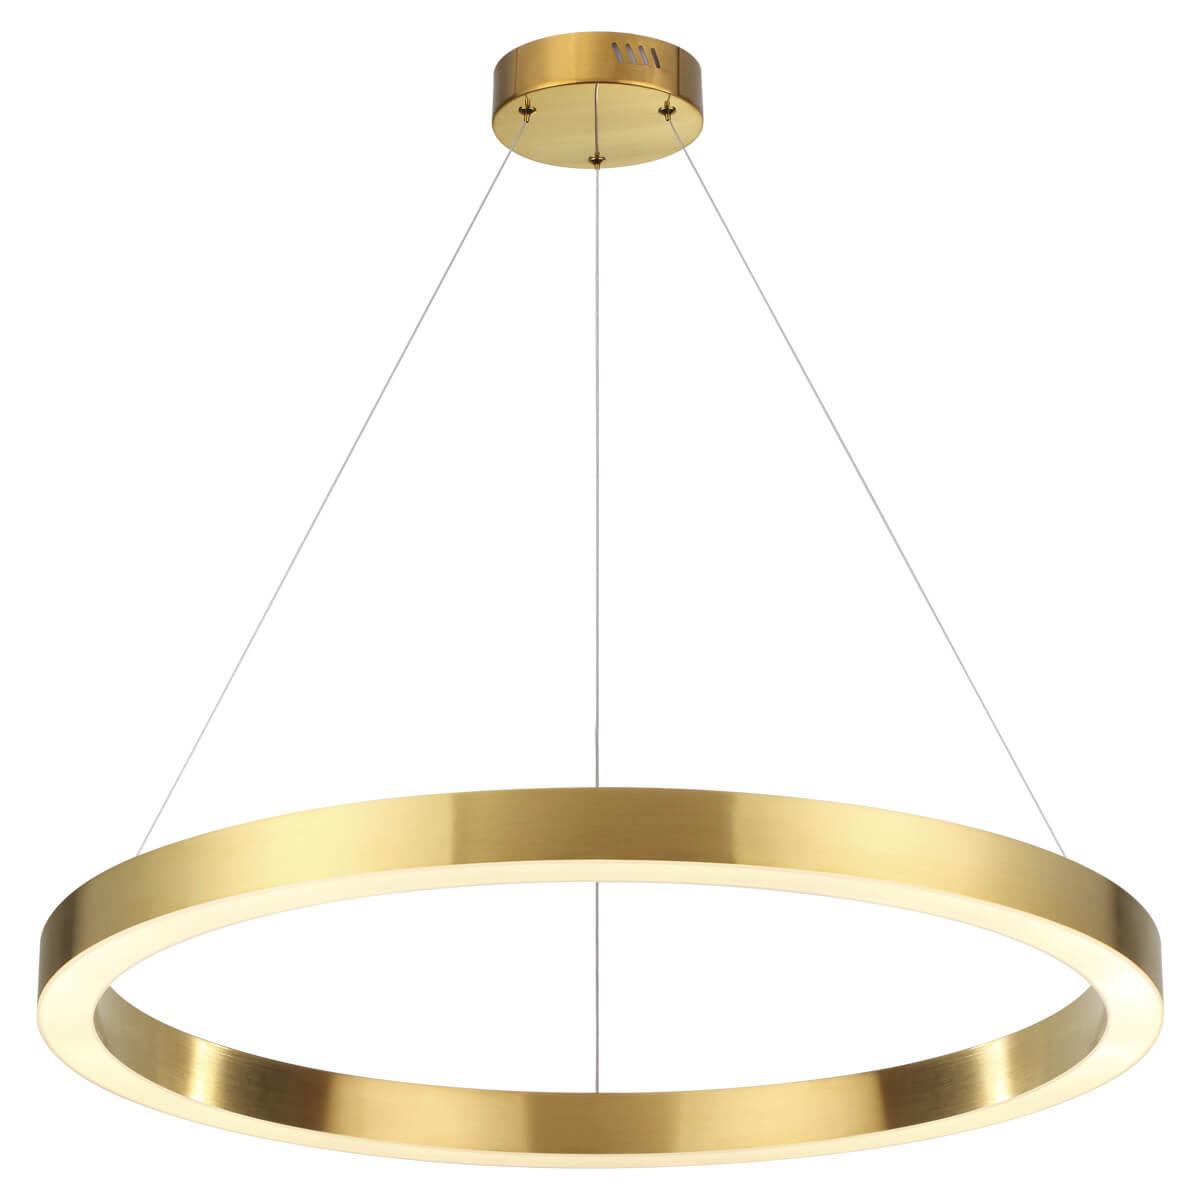 Светильник Odeon Light 3885/45LG L-vision